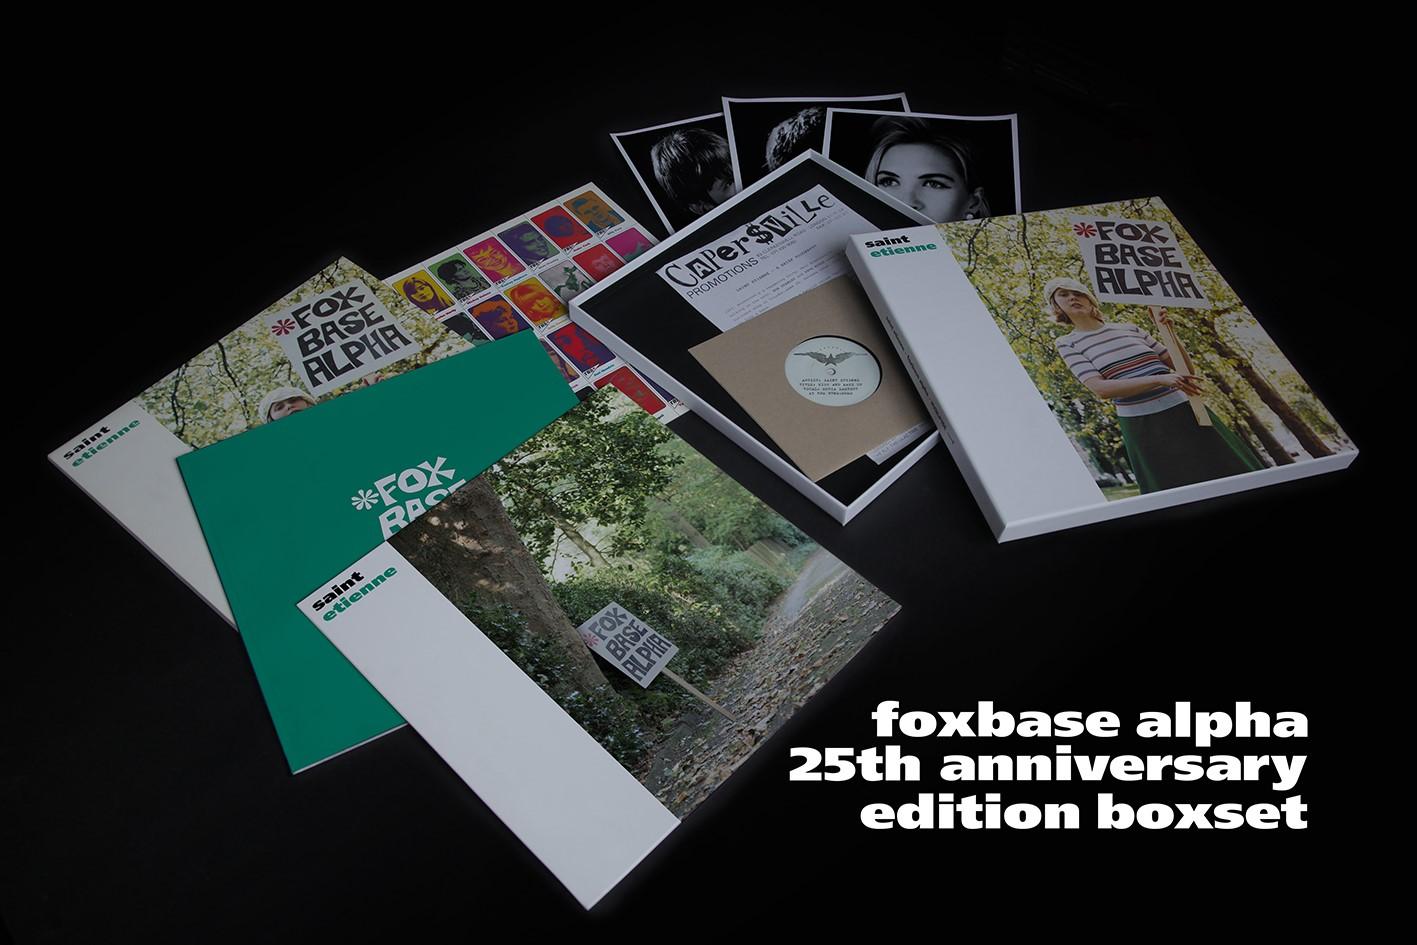 Saint Etienne Foxbase Alpha 25 Anniversary Boxset